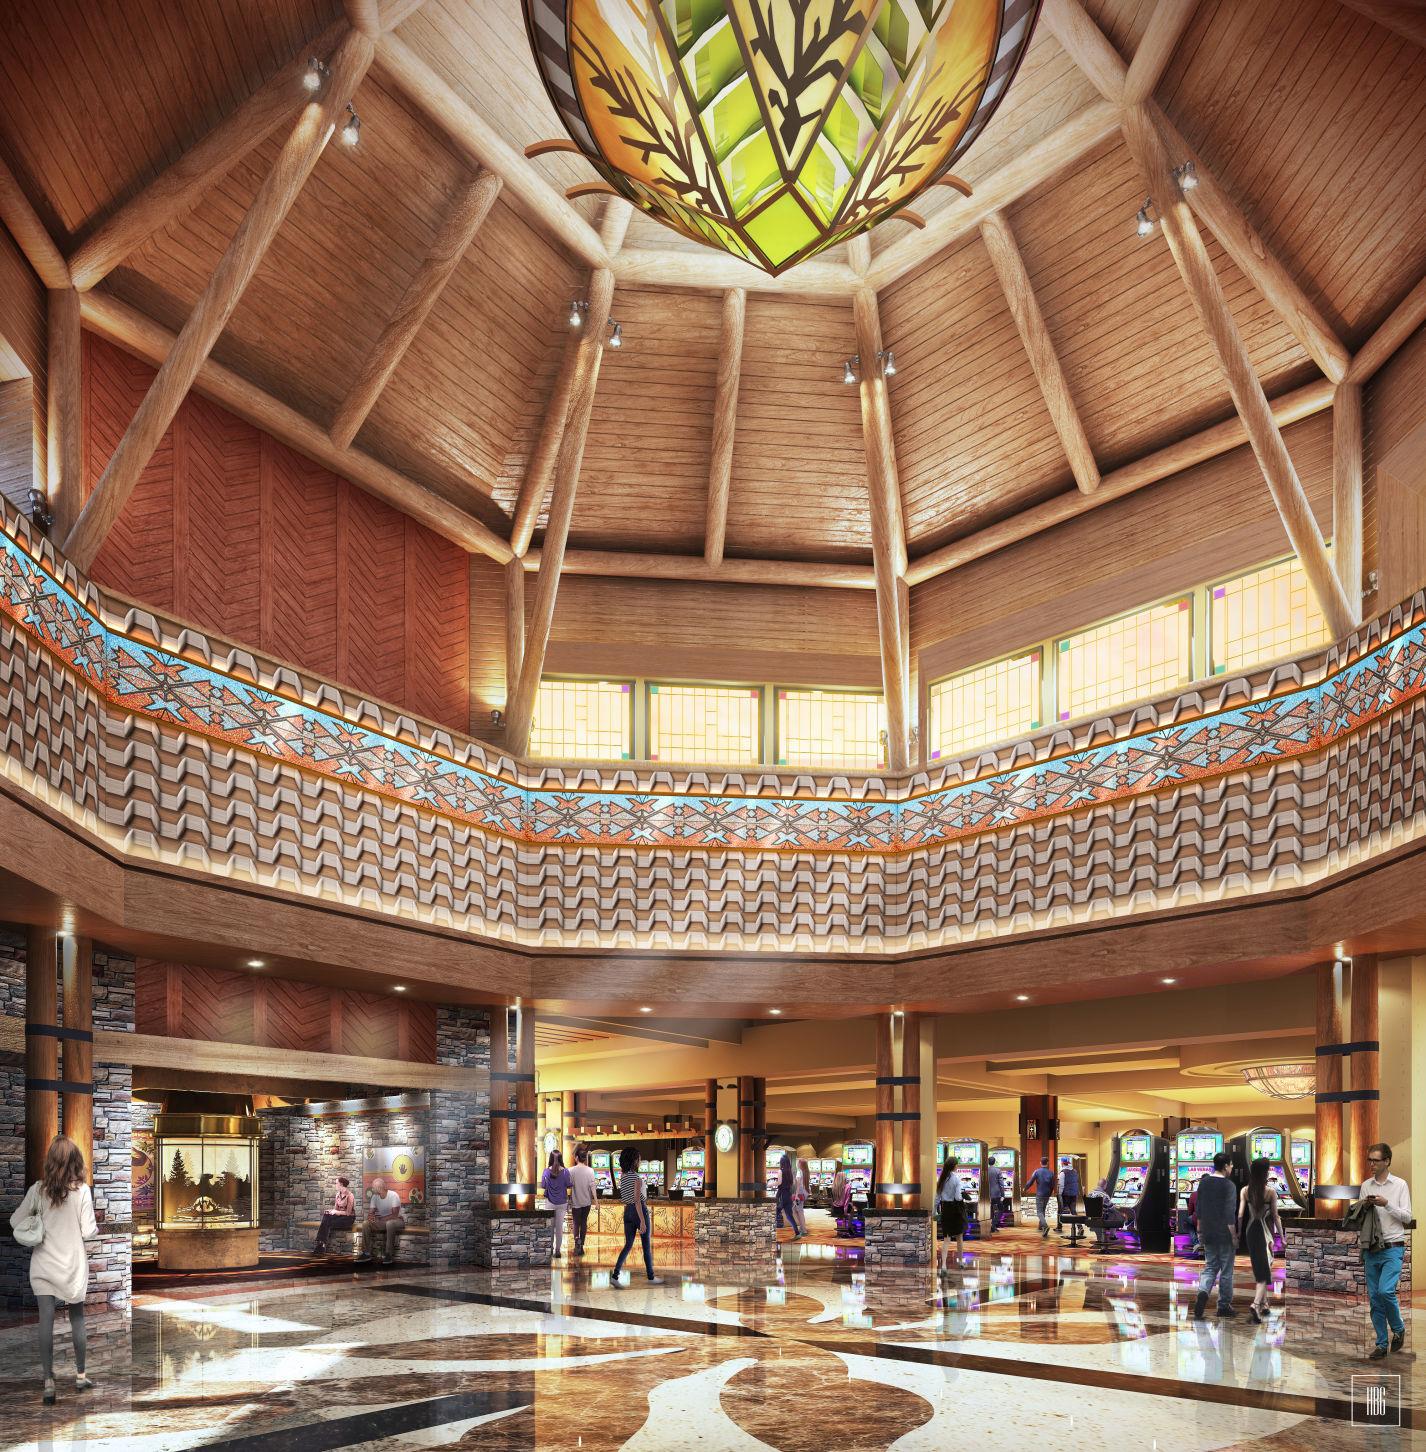 For winds casino bingo at casinos